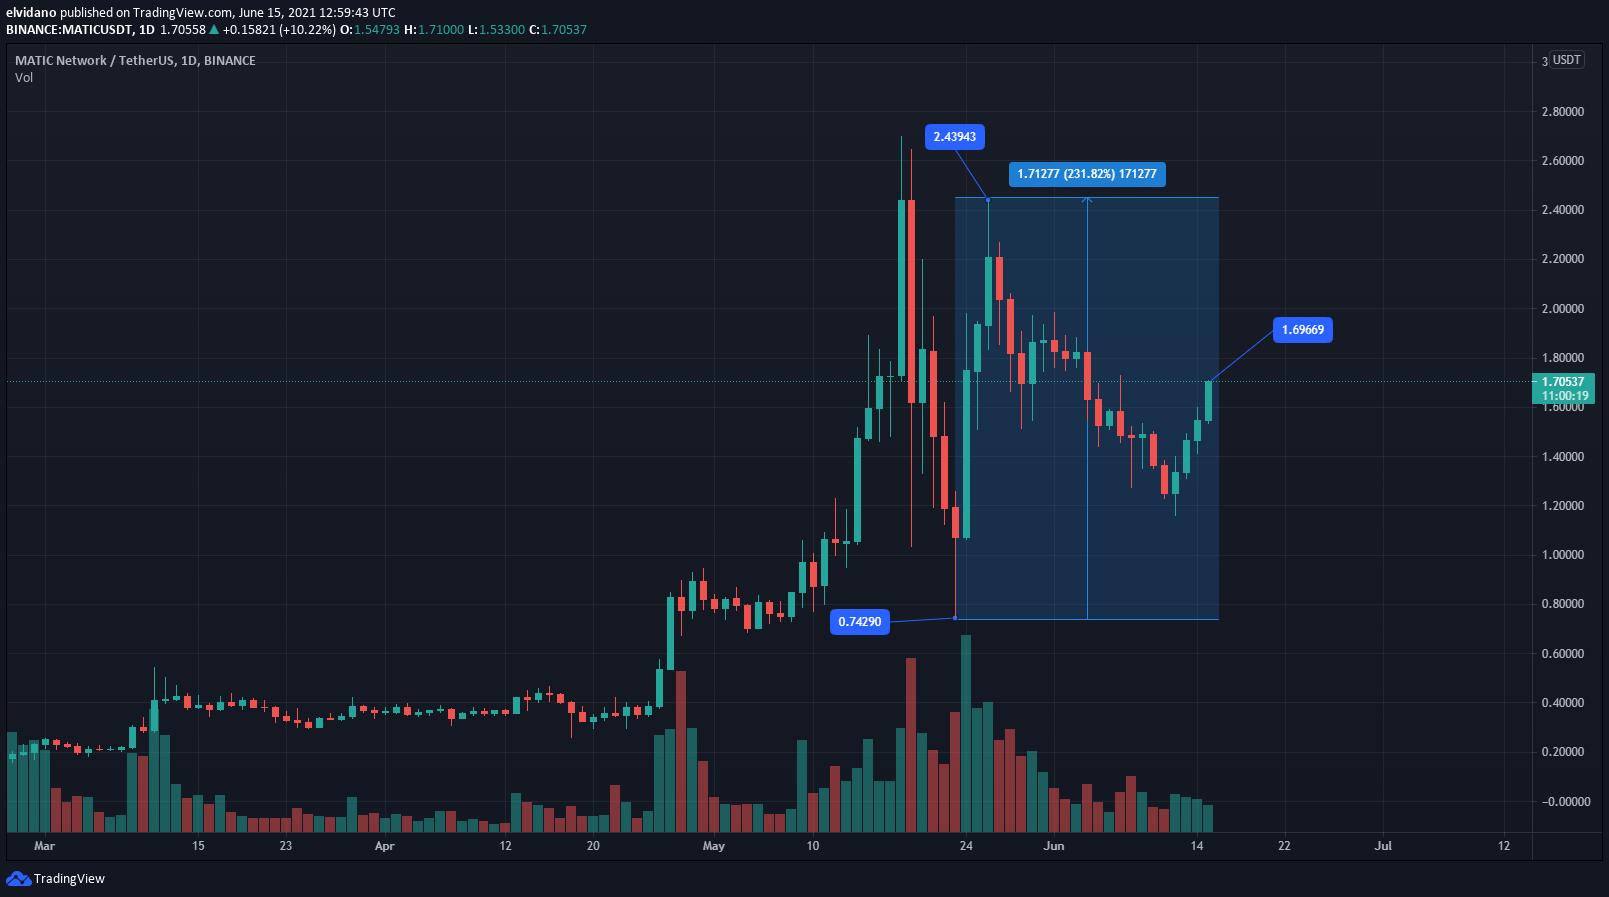 Polygon Volume and Price